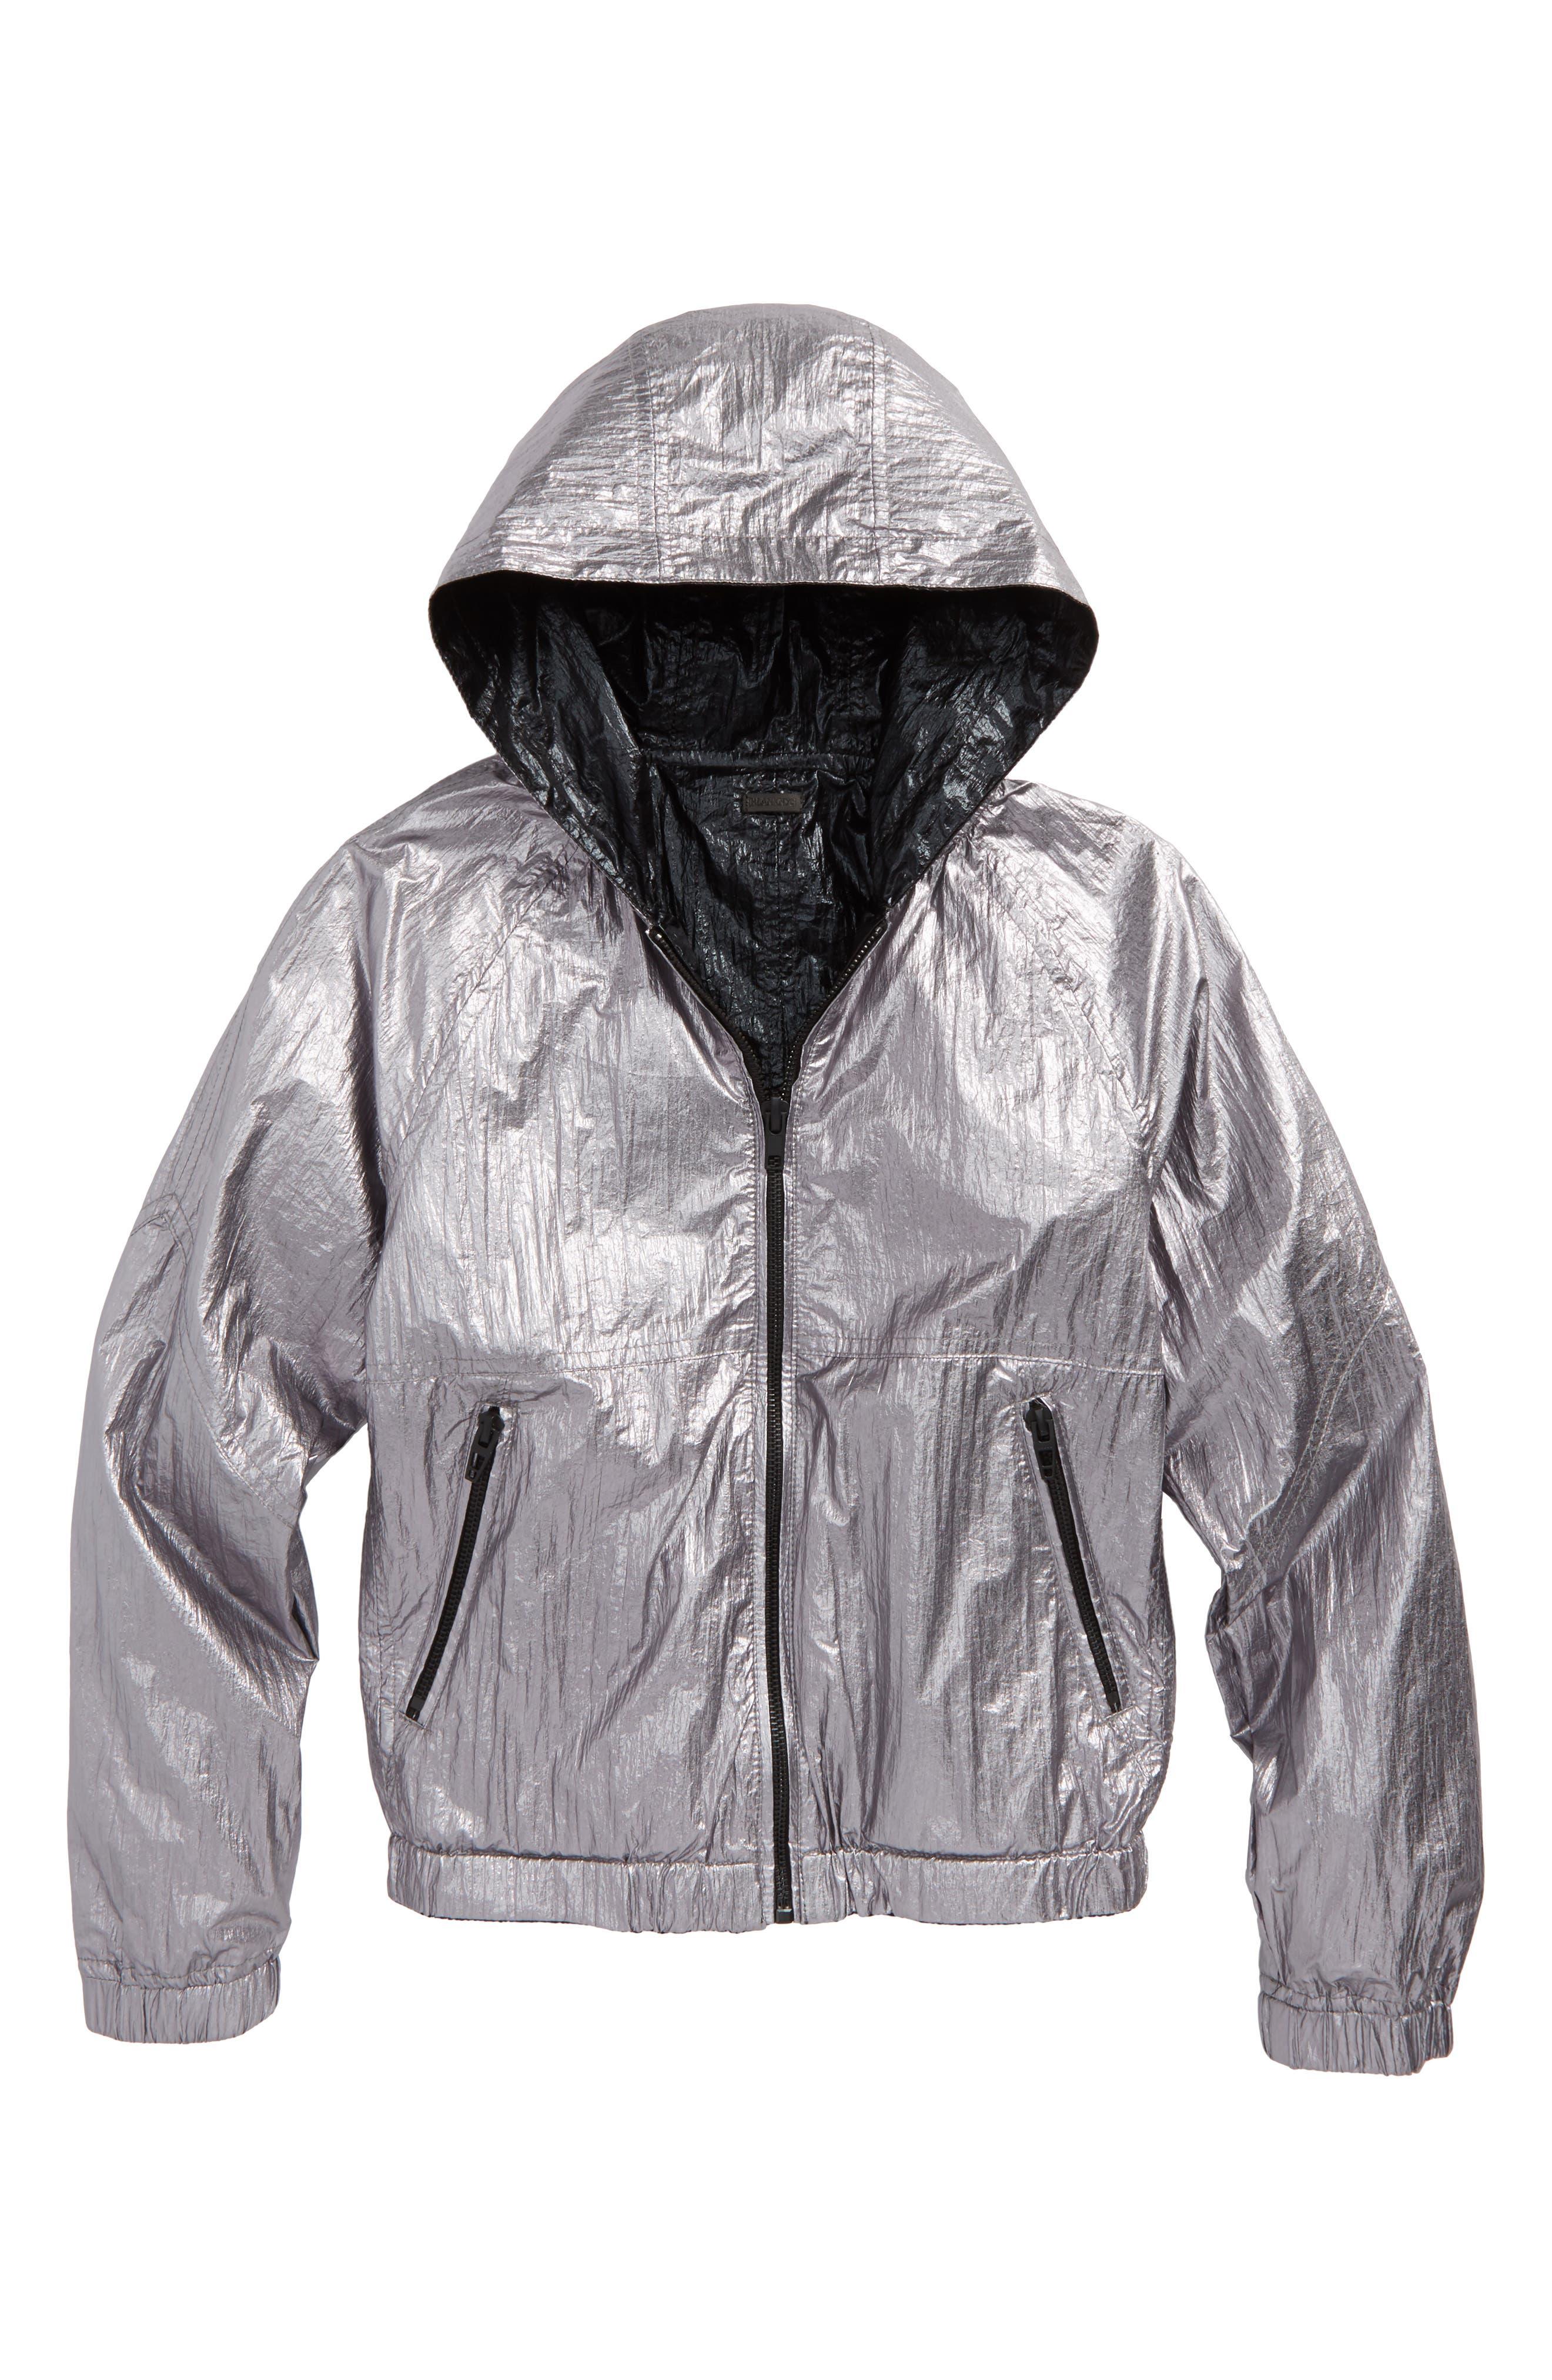 BLANCNYC Good Vibrations Reversible Hooded Jacket,                             Alternate thumbnail 2, color,                             Black/ Silver